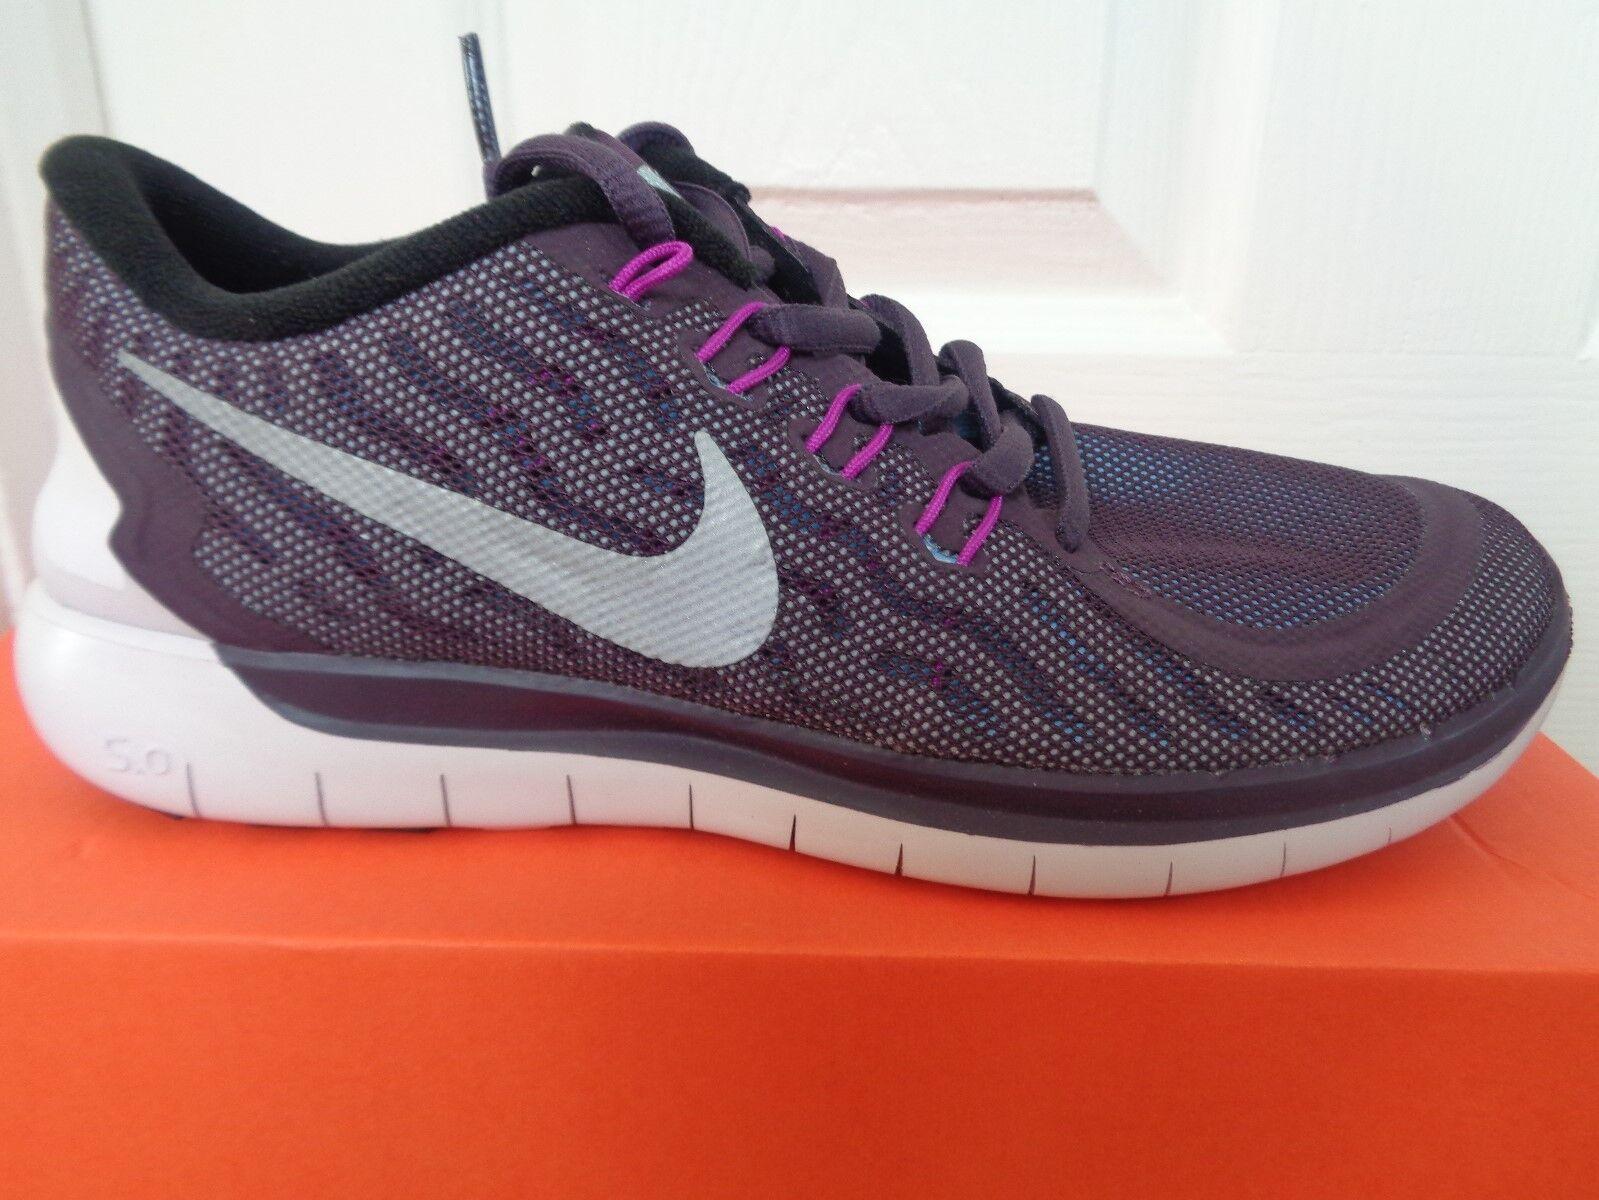 Nike Free 5.0 Flash Wmns Baskets Basket 806575 500 UK 4 EU 37.5 US 6.5 Neuf + Boîte